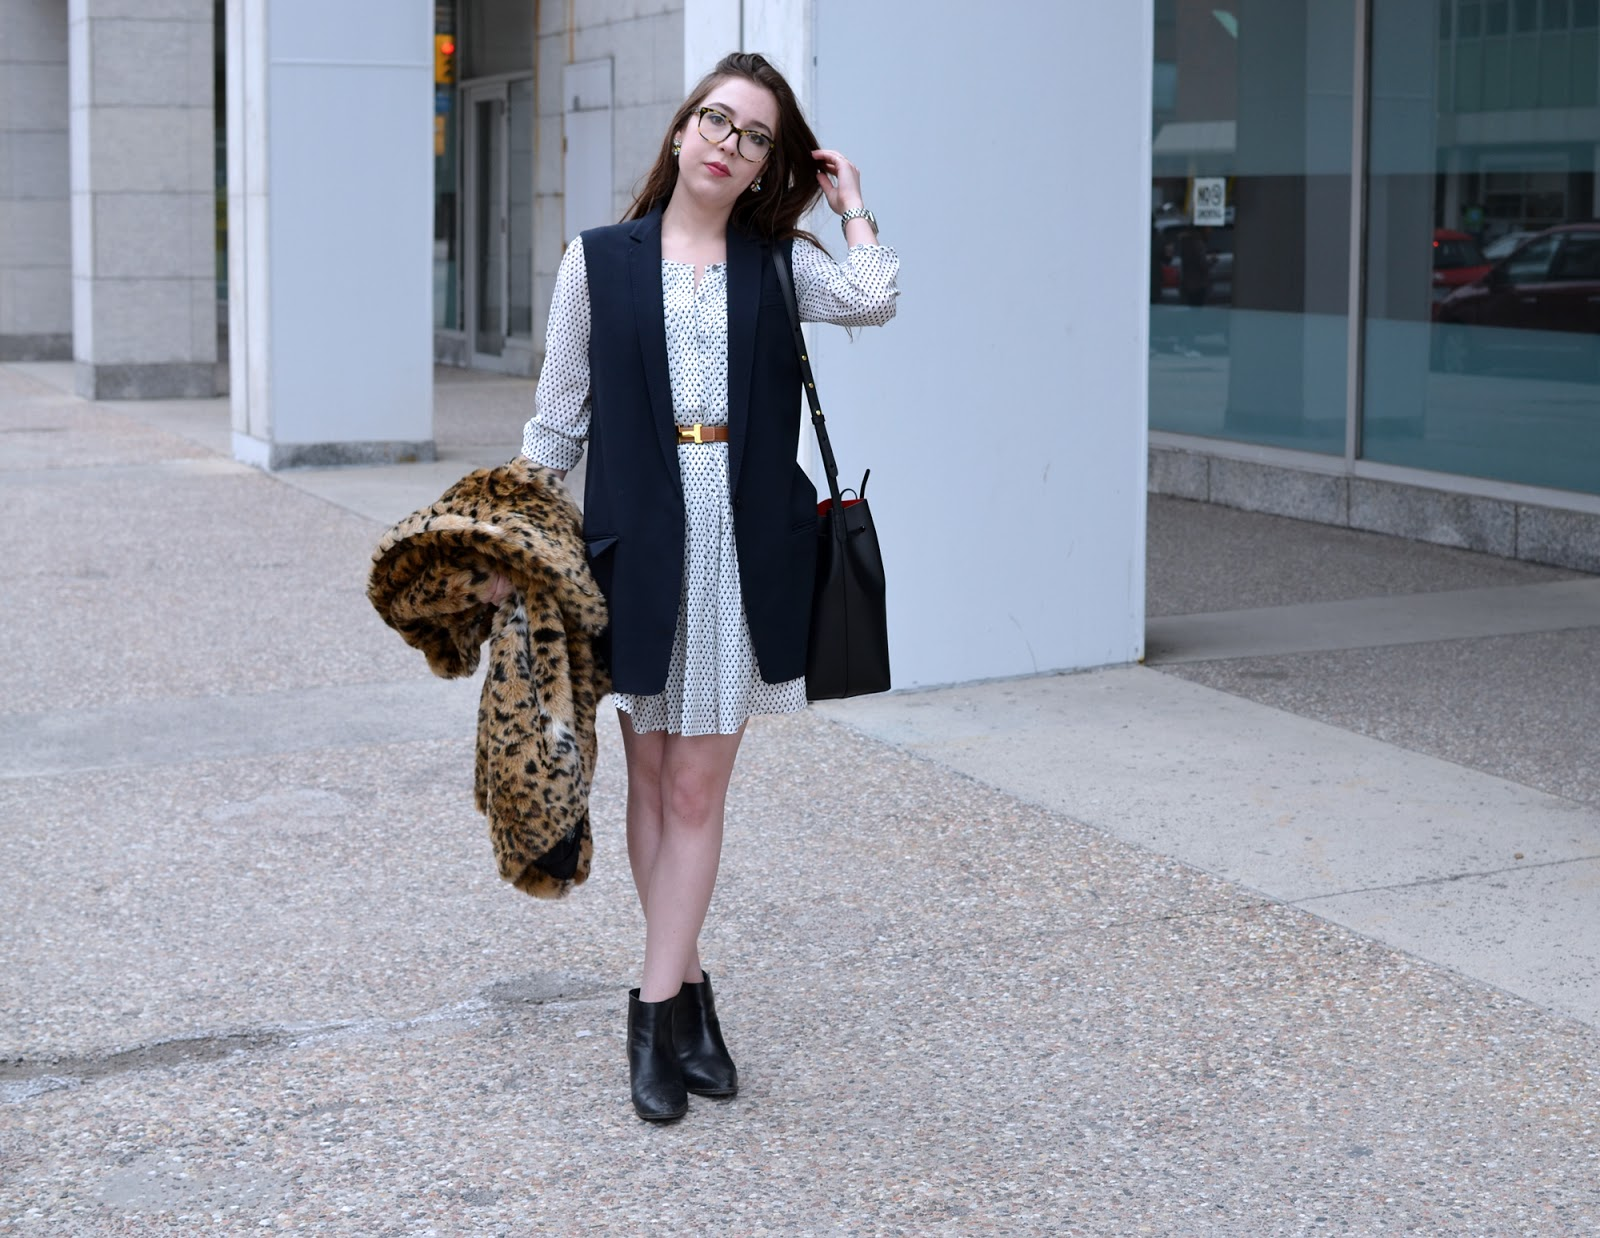 OOTD with a dress from Club Monaco, a Rag & Bone vest, Aritzia leopard coat, Mansur Gavriel bucket bag, and Zara Chelsea boots